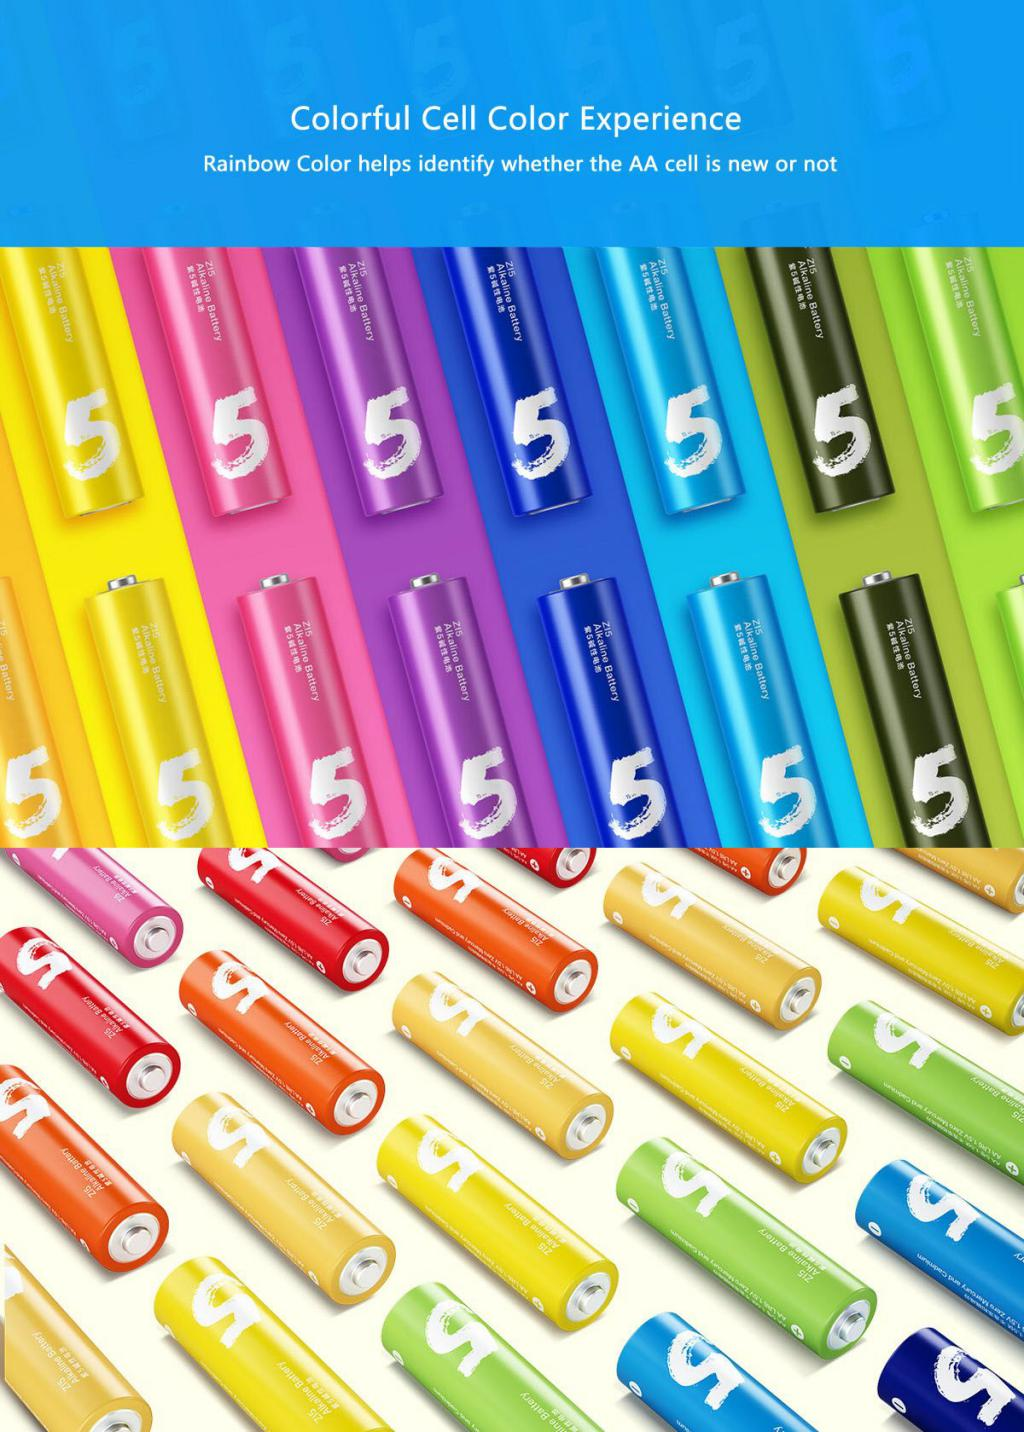 Xiaomi Zi5 Rainbow 1 5v Aa Alkaline Battery Set 10pcs (5)